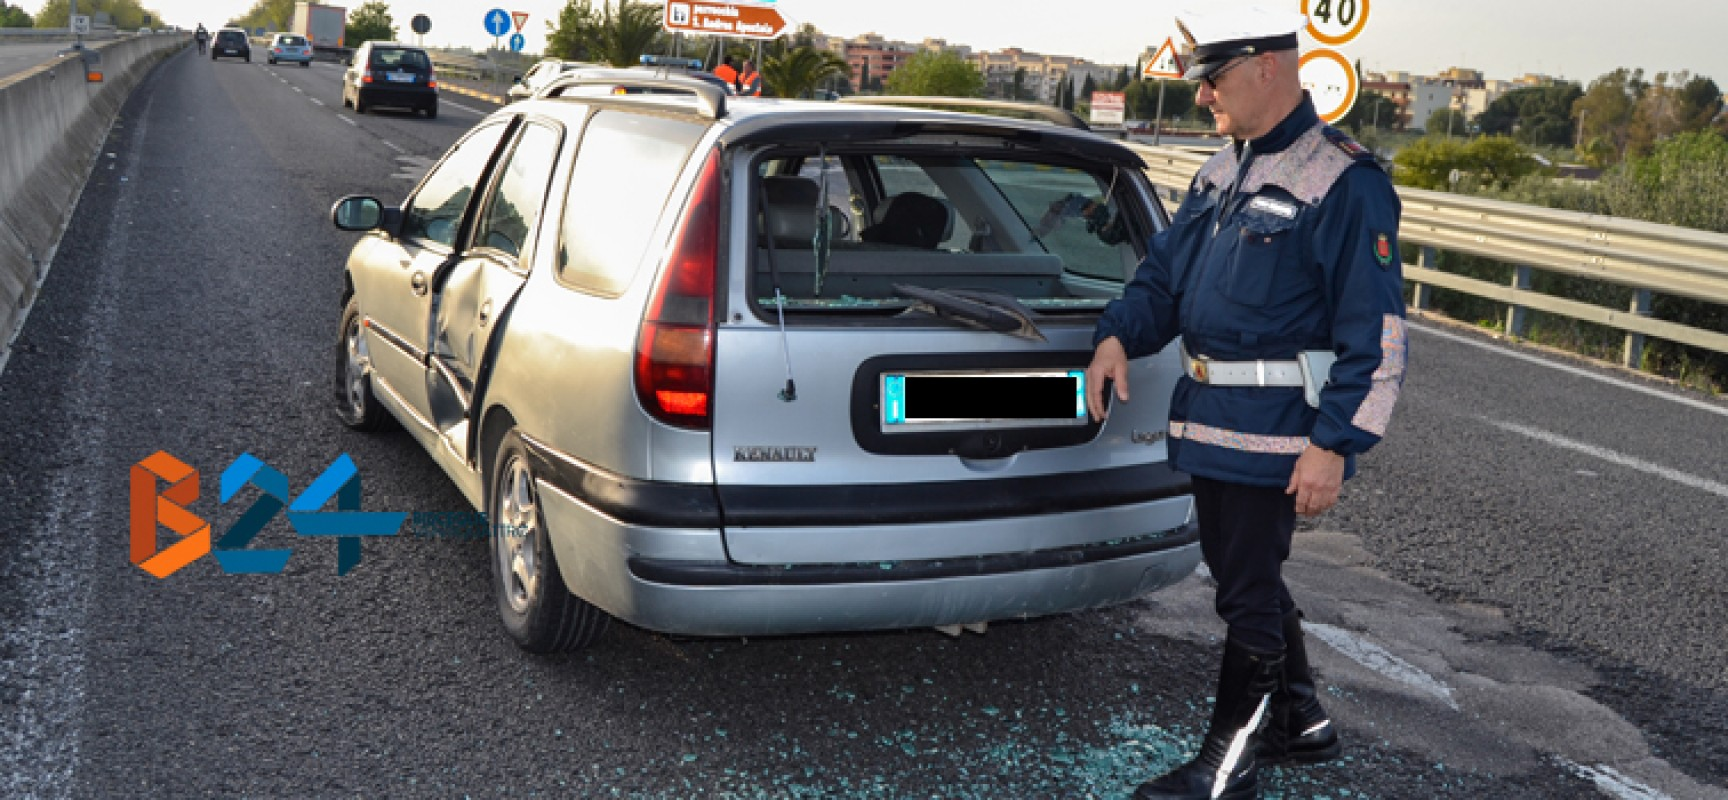 Tir perde la ruota di scorta, rocambolesco incidente sulla 16 bis / FOTO